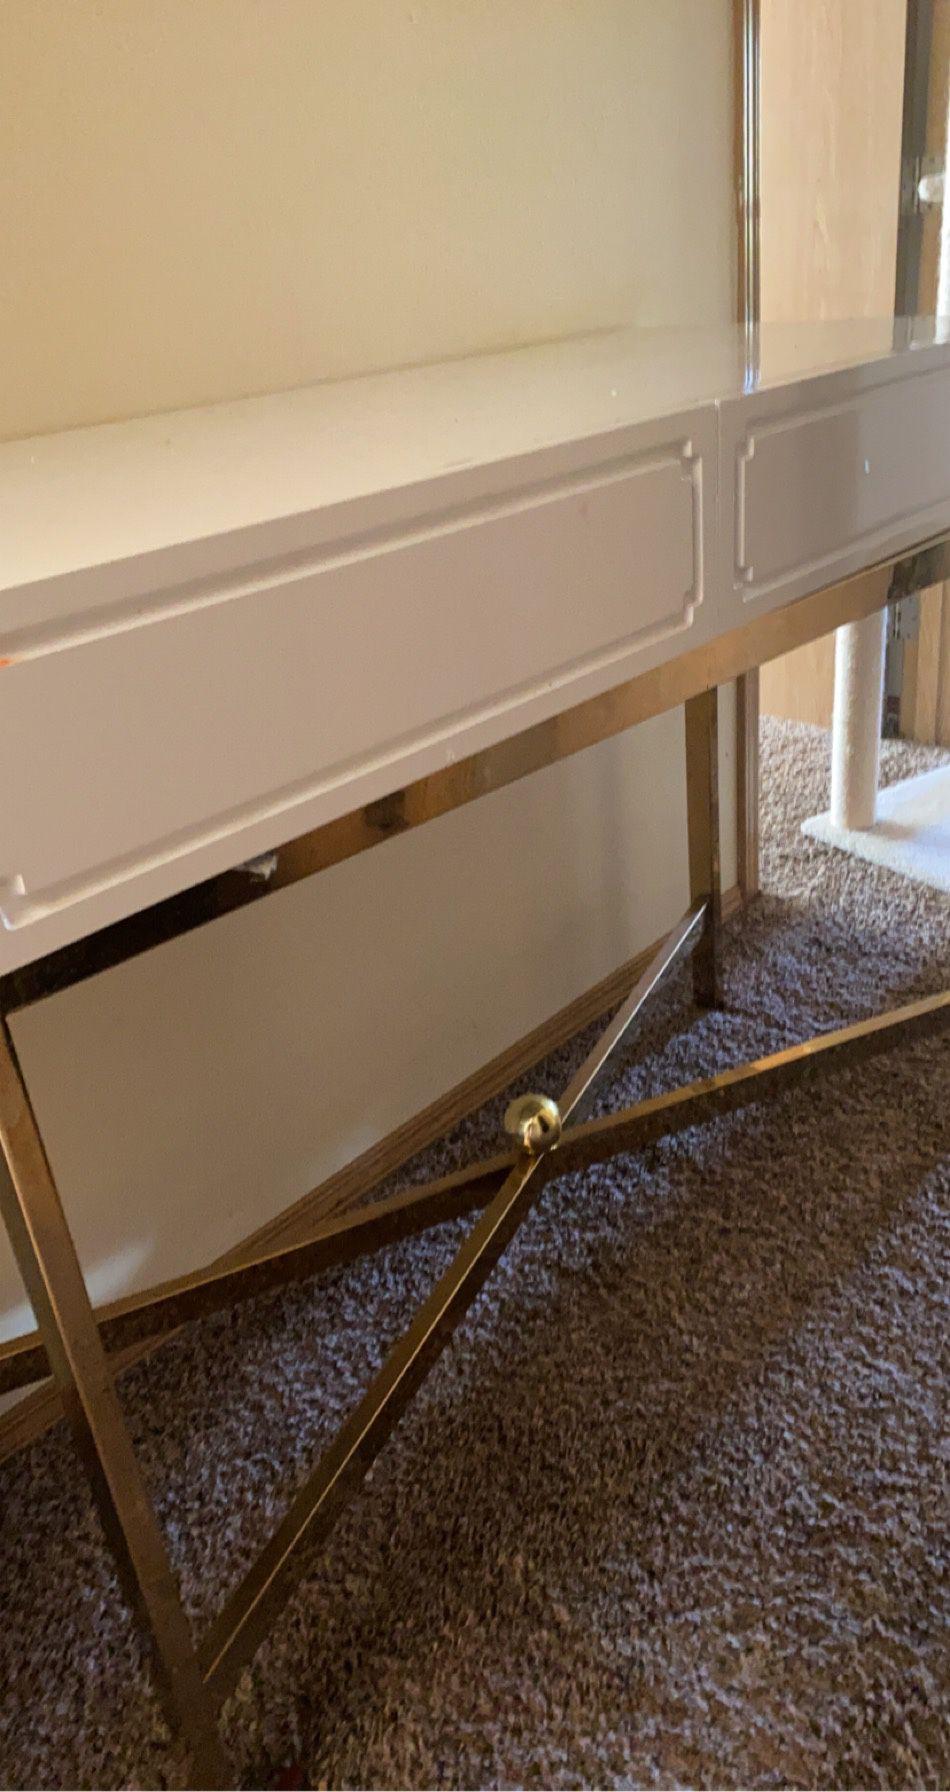 Desk/ vanity